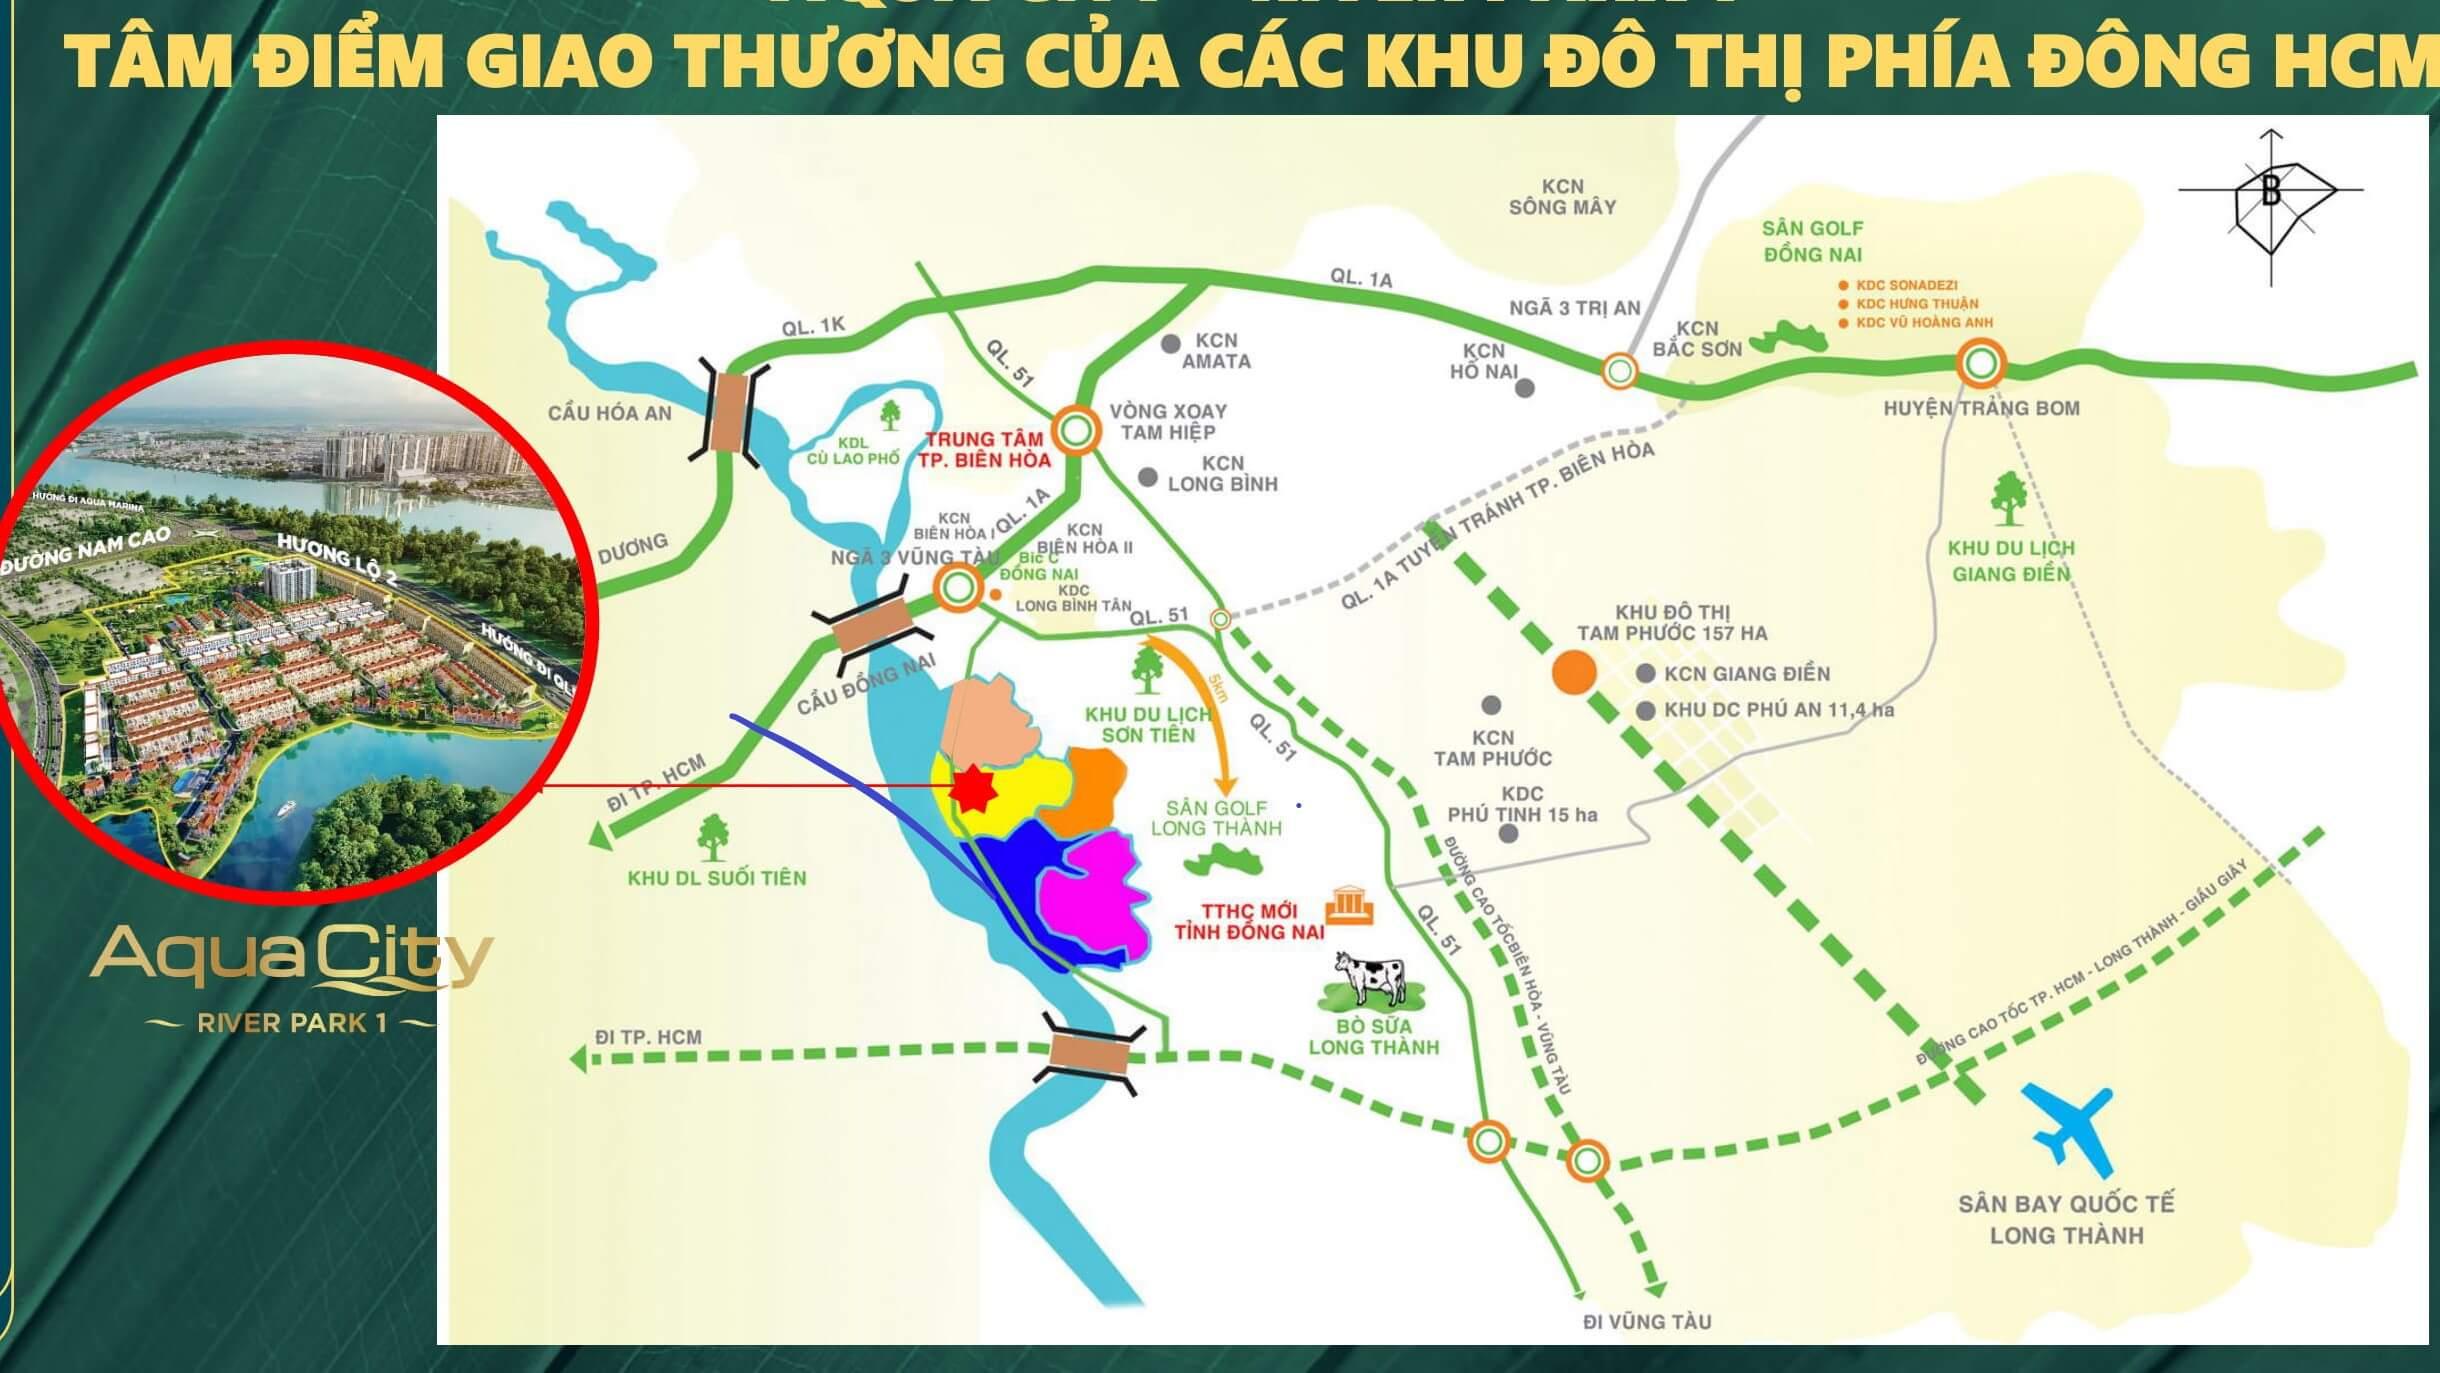 loi-the-vi-tri-giao-thuong-di-chuyen-thuan-loi-Phan-Khu-River-Park-1-tam-diem-giao-thuong-khu-do-thi-phia-dong-hcm-du-an-Aqua-City-Dong-Nai-Novaland